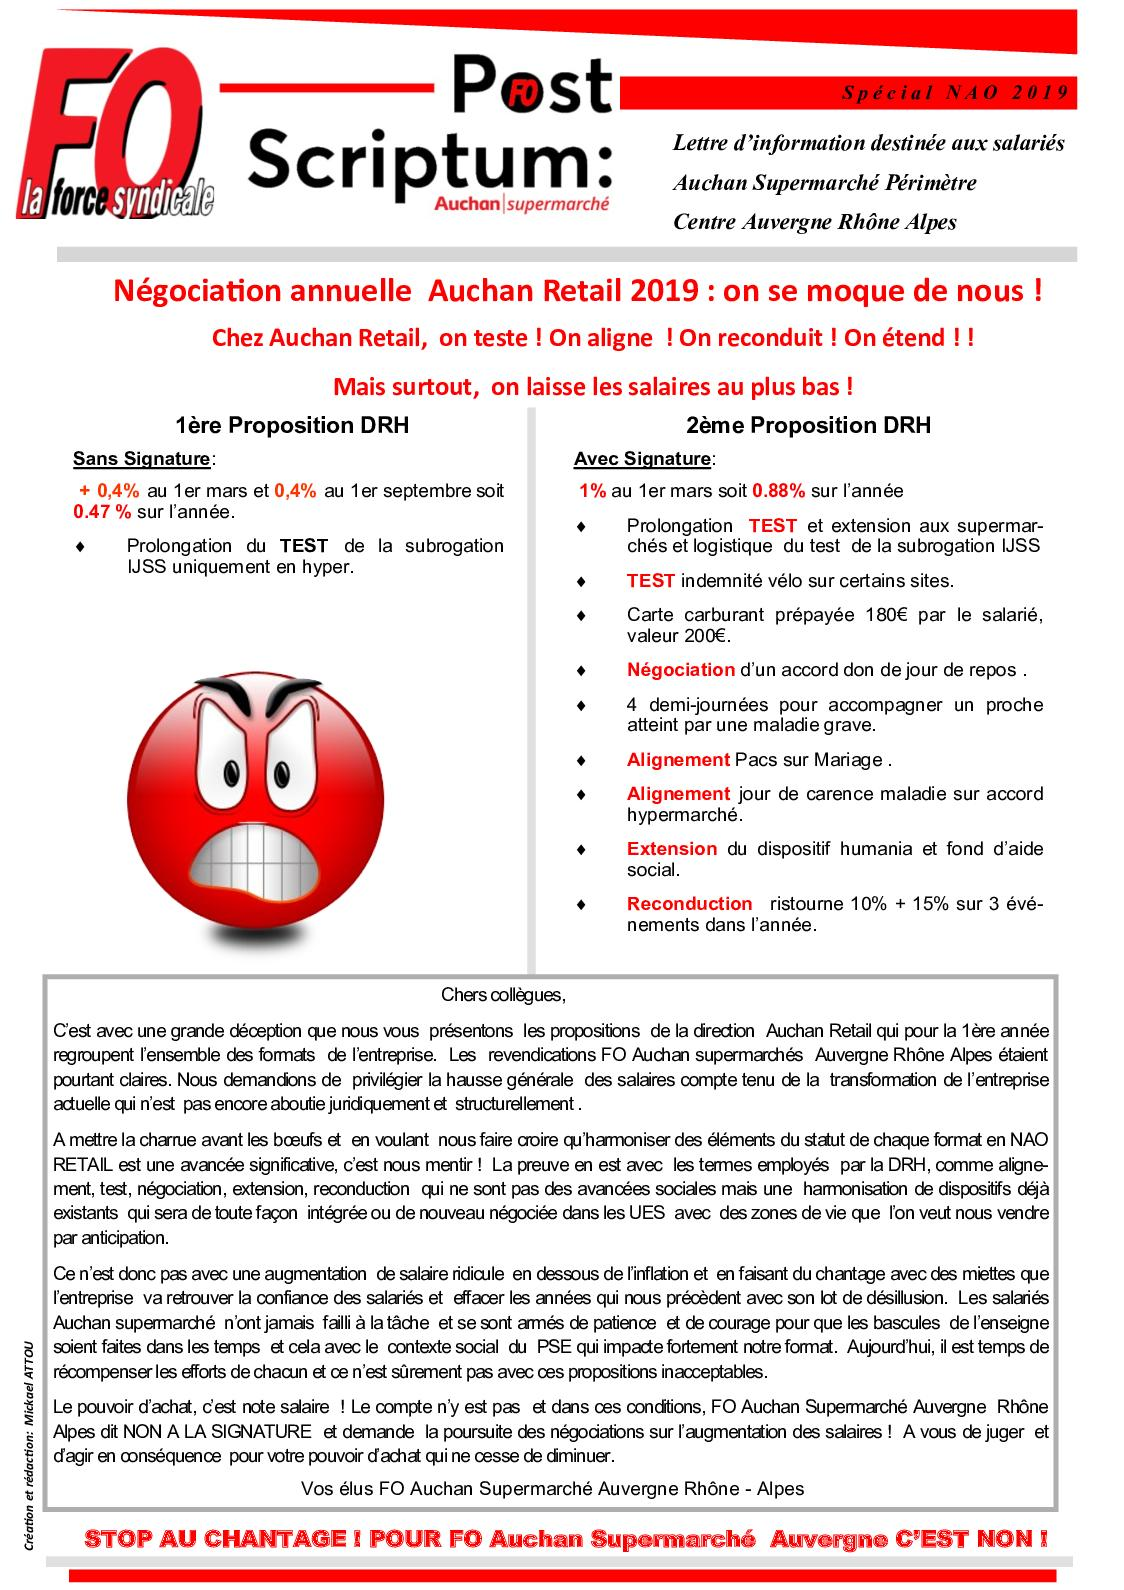 Carte Auchan Ristourne.Calameo Post Scriptum Nao 2019 Auchan Retail France